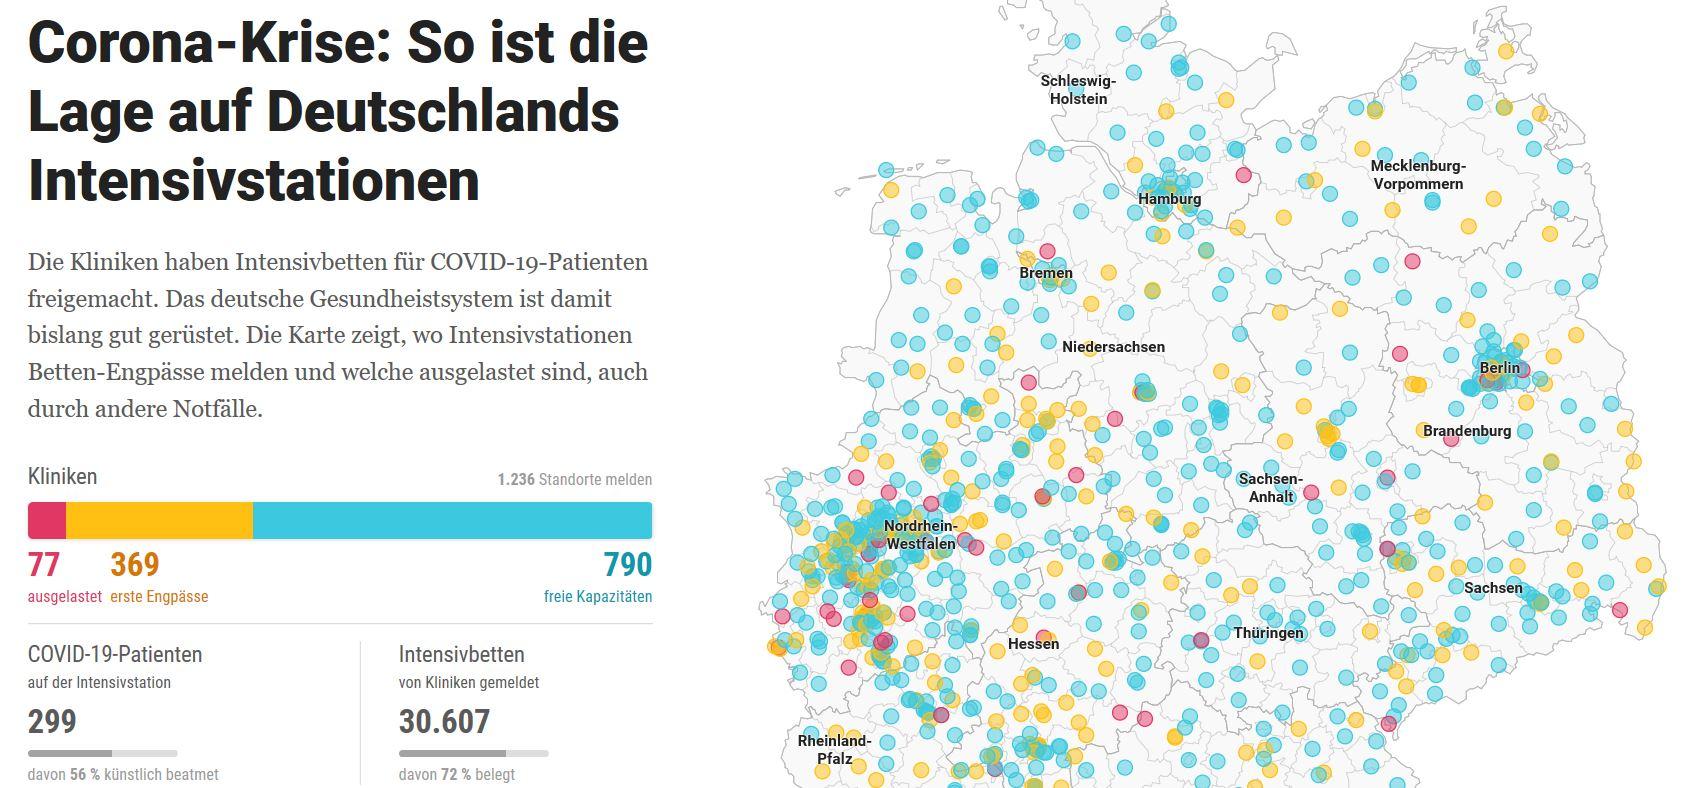 "Zdroj obrázku: <a href=""https://interaktiv.morgenpost.de/corona-deutschland-intensiv-betten-monitor-krankenhaus-auslastung/"">https://interaktiv.morgenpost.de/corona-deutschland-intensiv-betten-monitor-krankenhaus-auslastung/</a>"